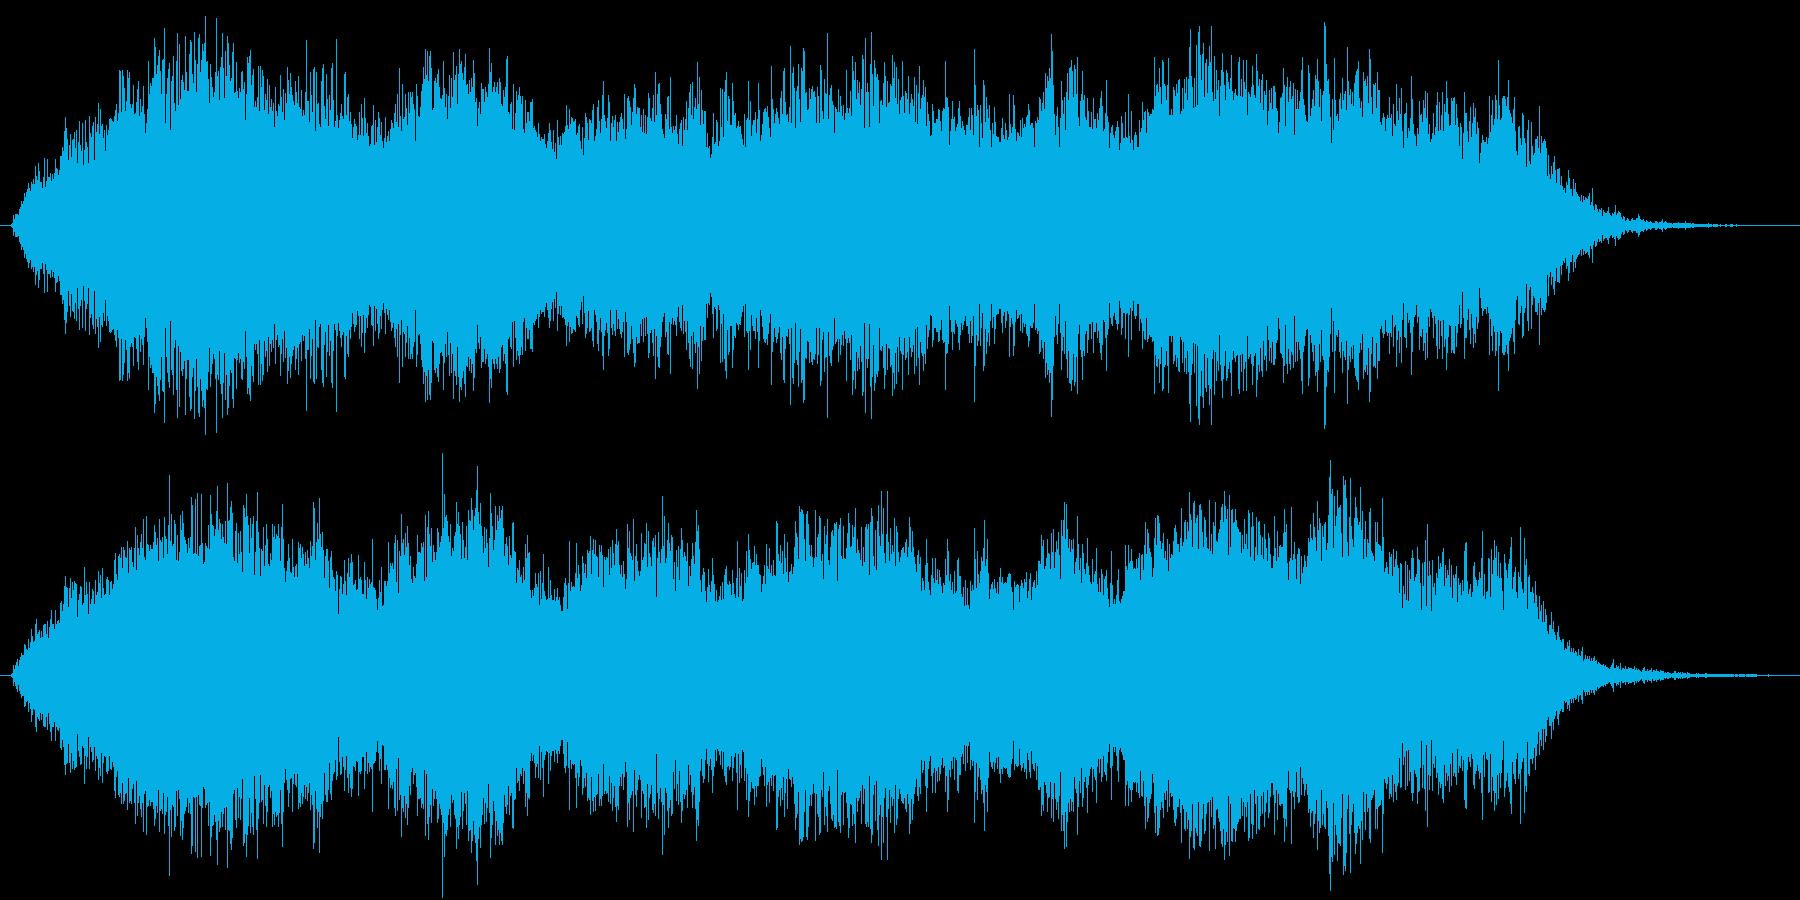 SF系、宇宙に漂っているようなBGMの再生済みの波形